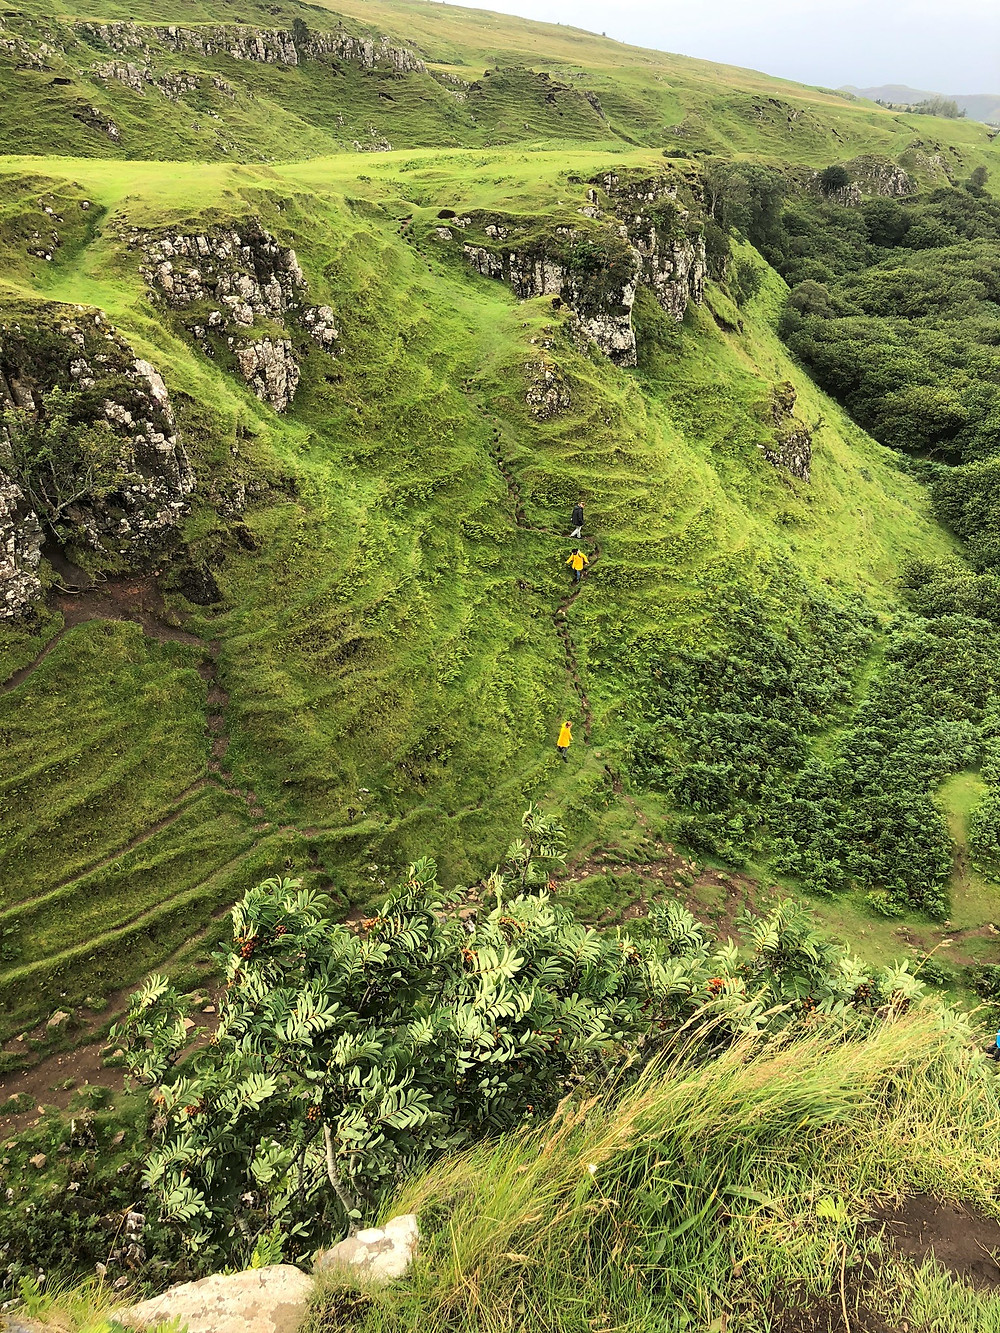 People climbing the green knolls of Fairy Glen on the Isle of Skye